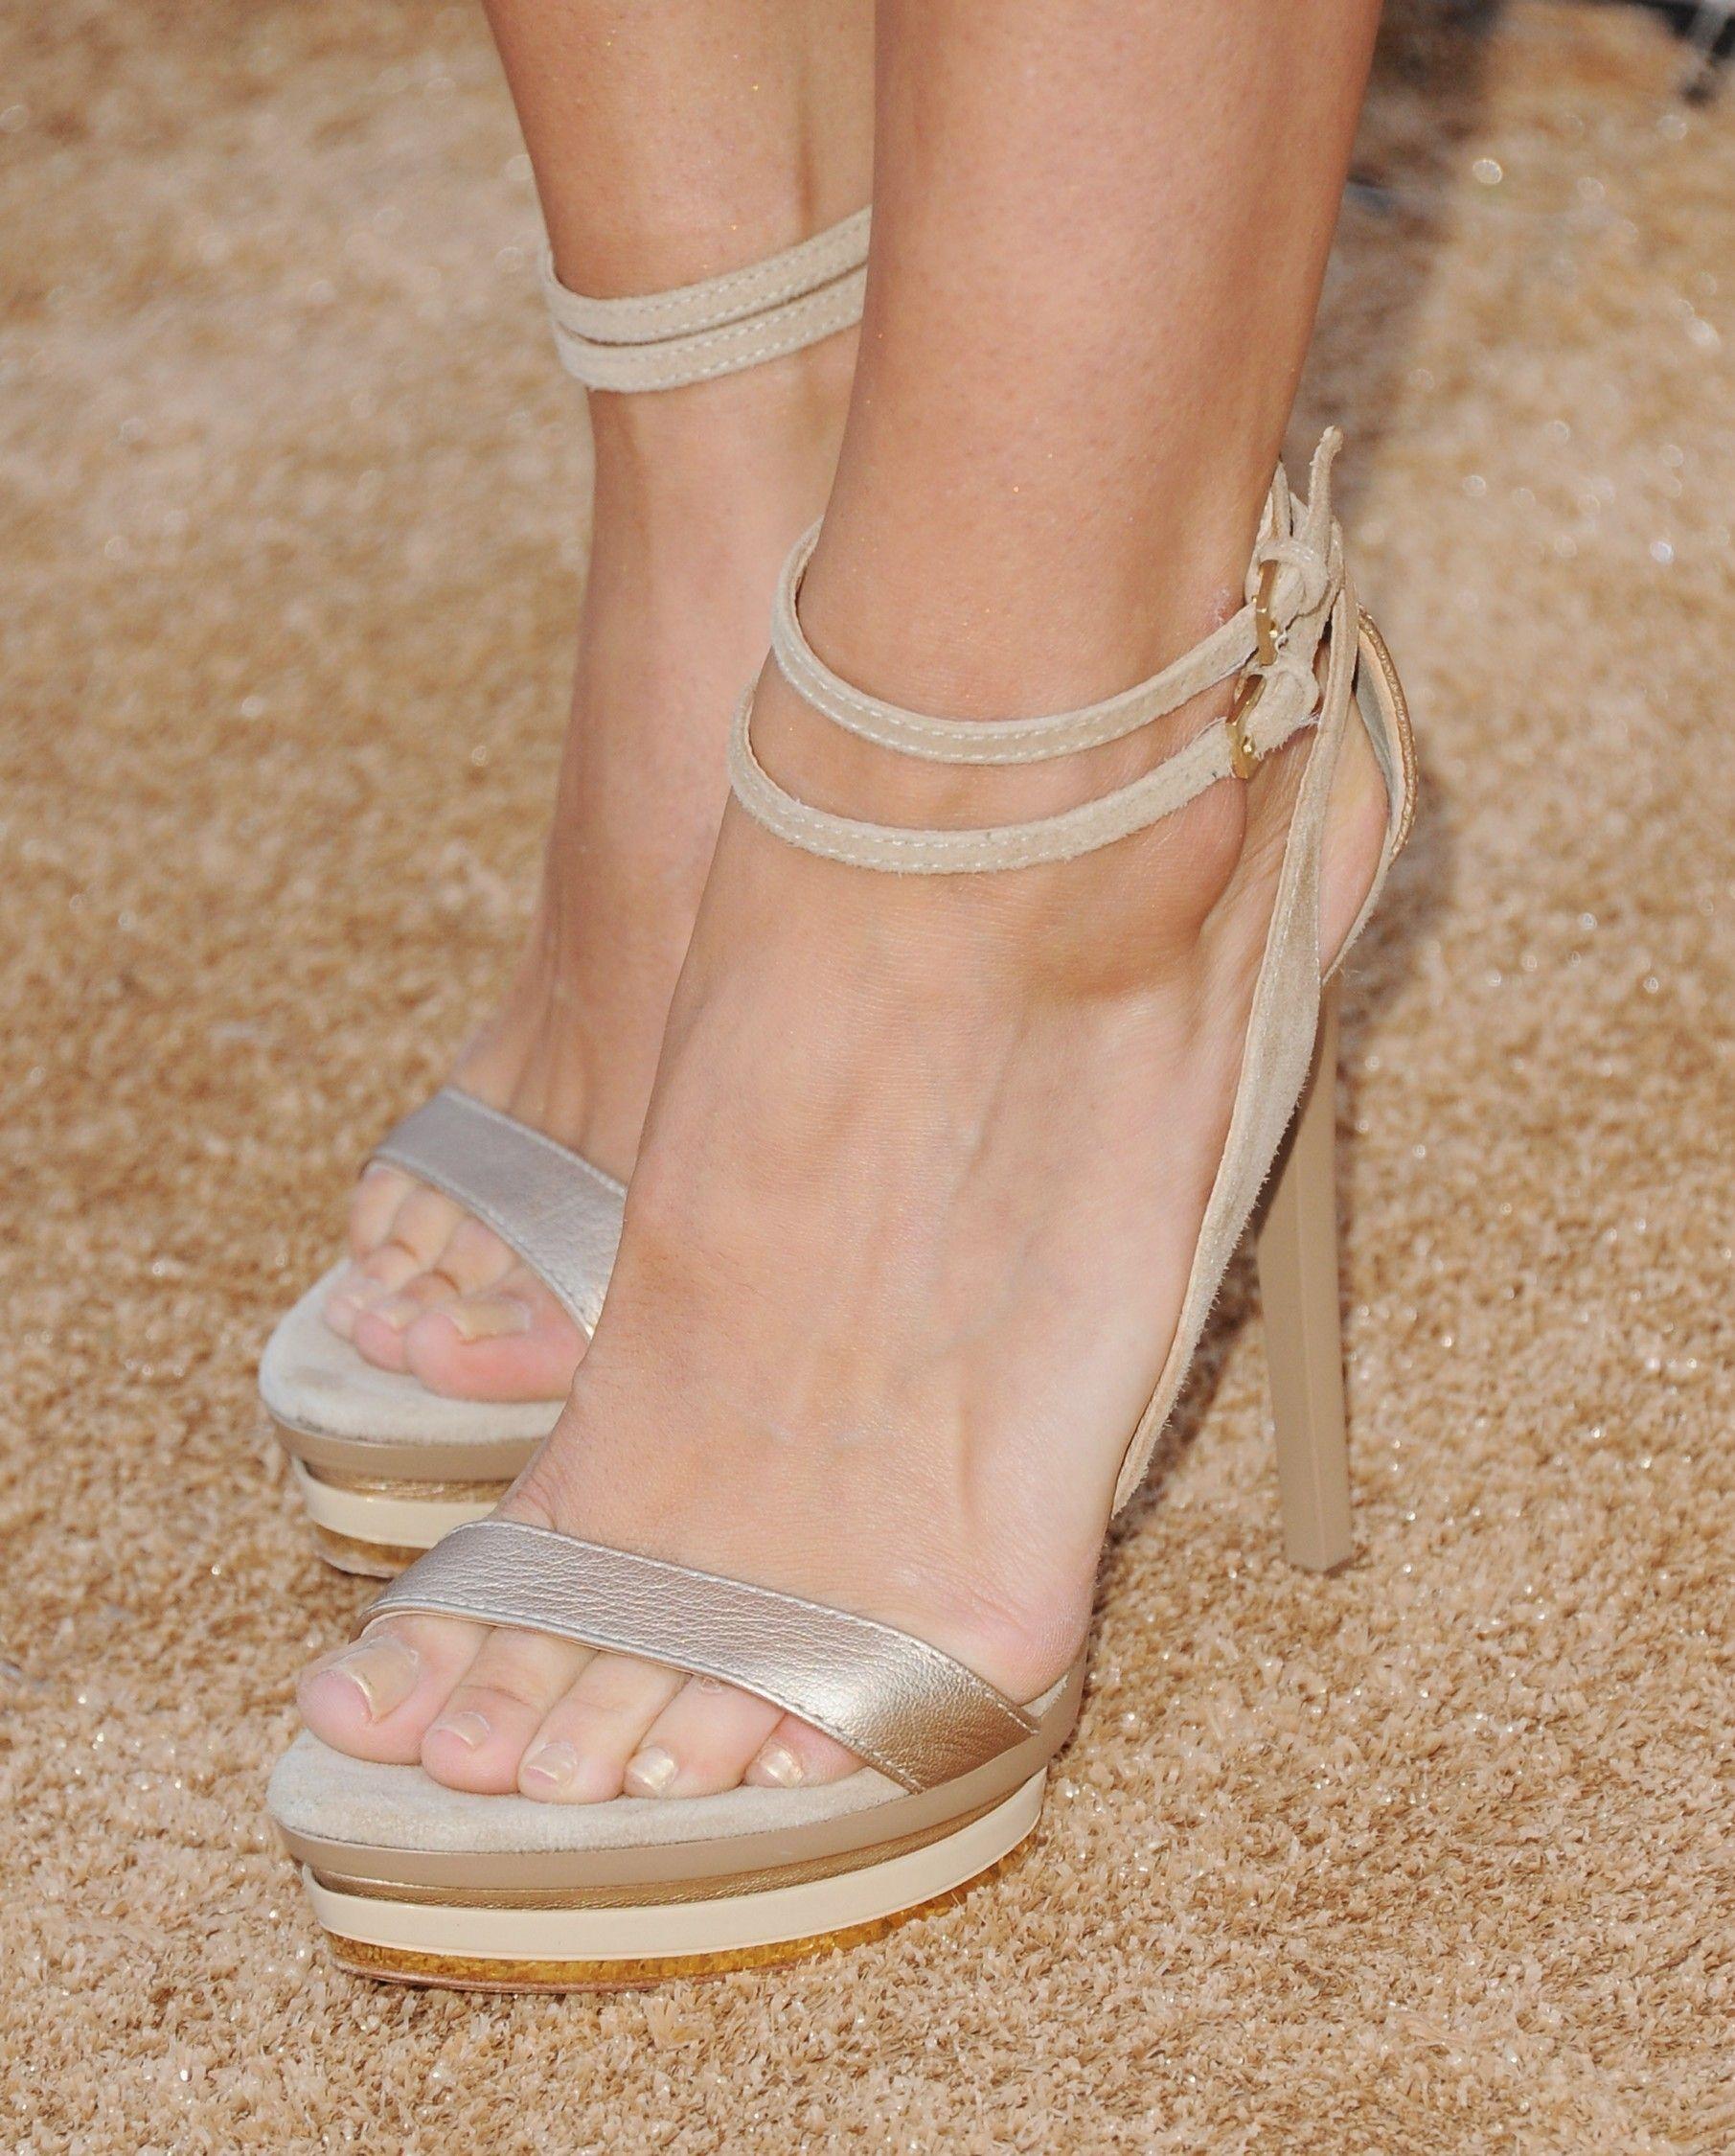 Meghan Ory Feet